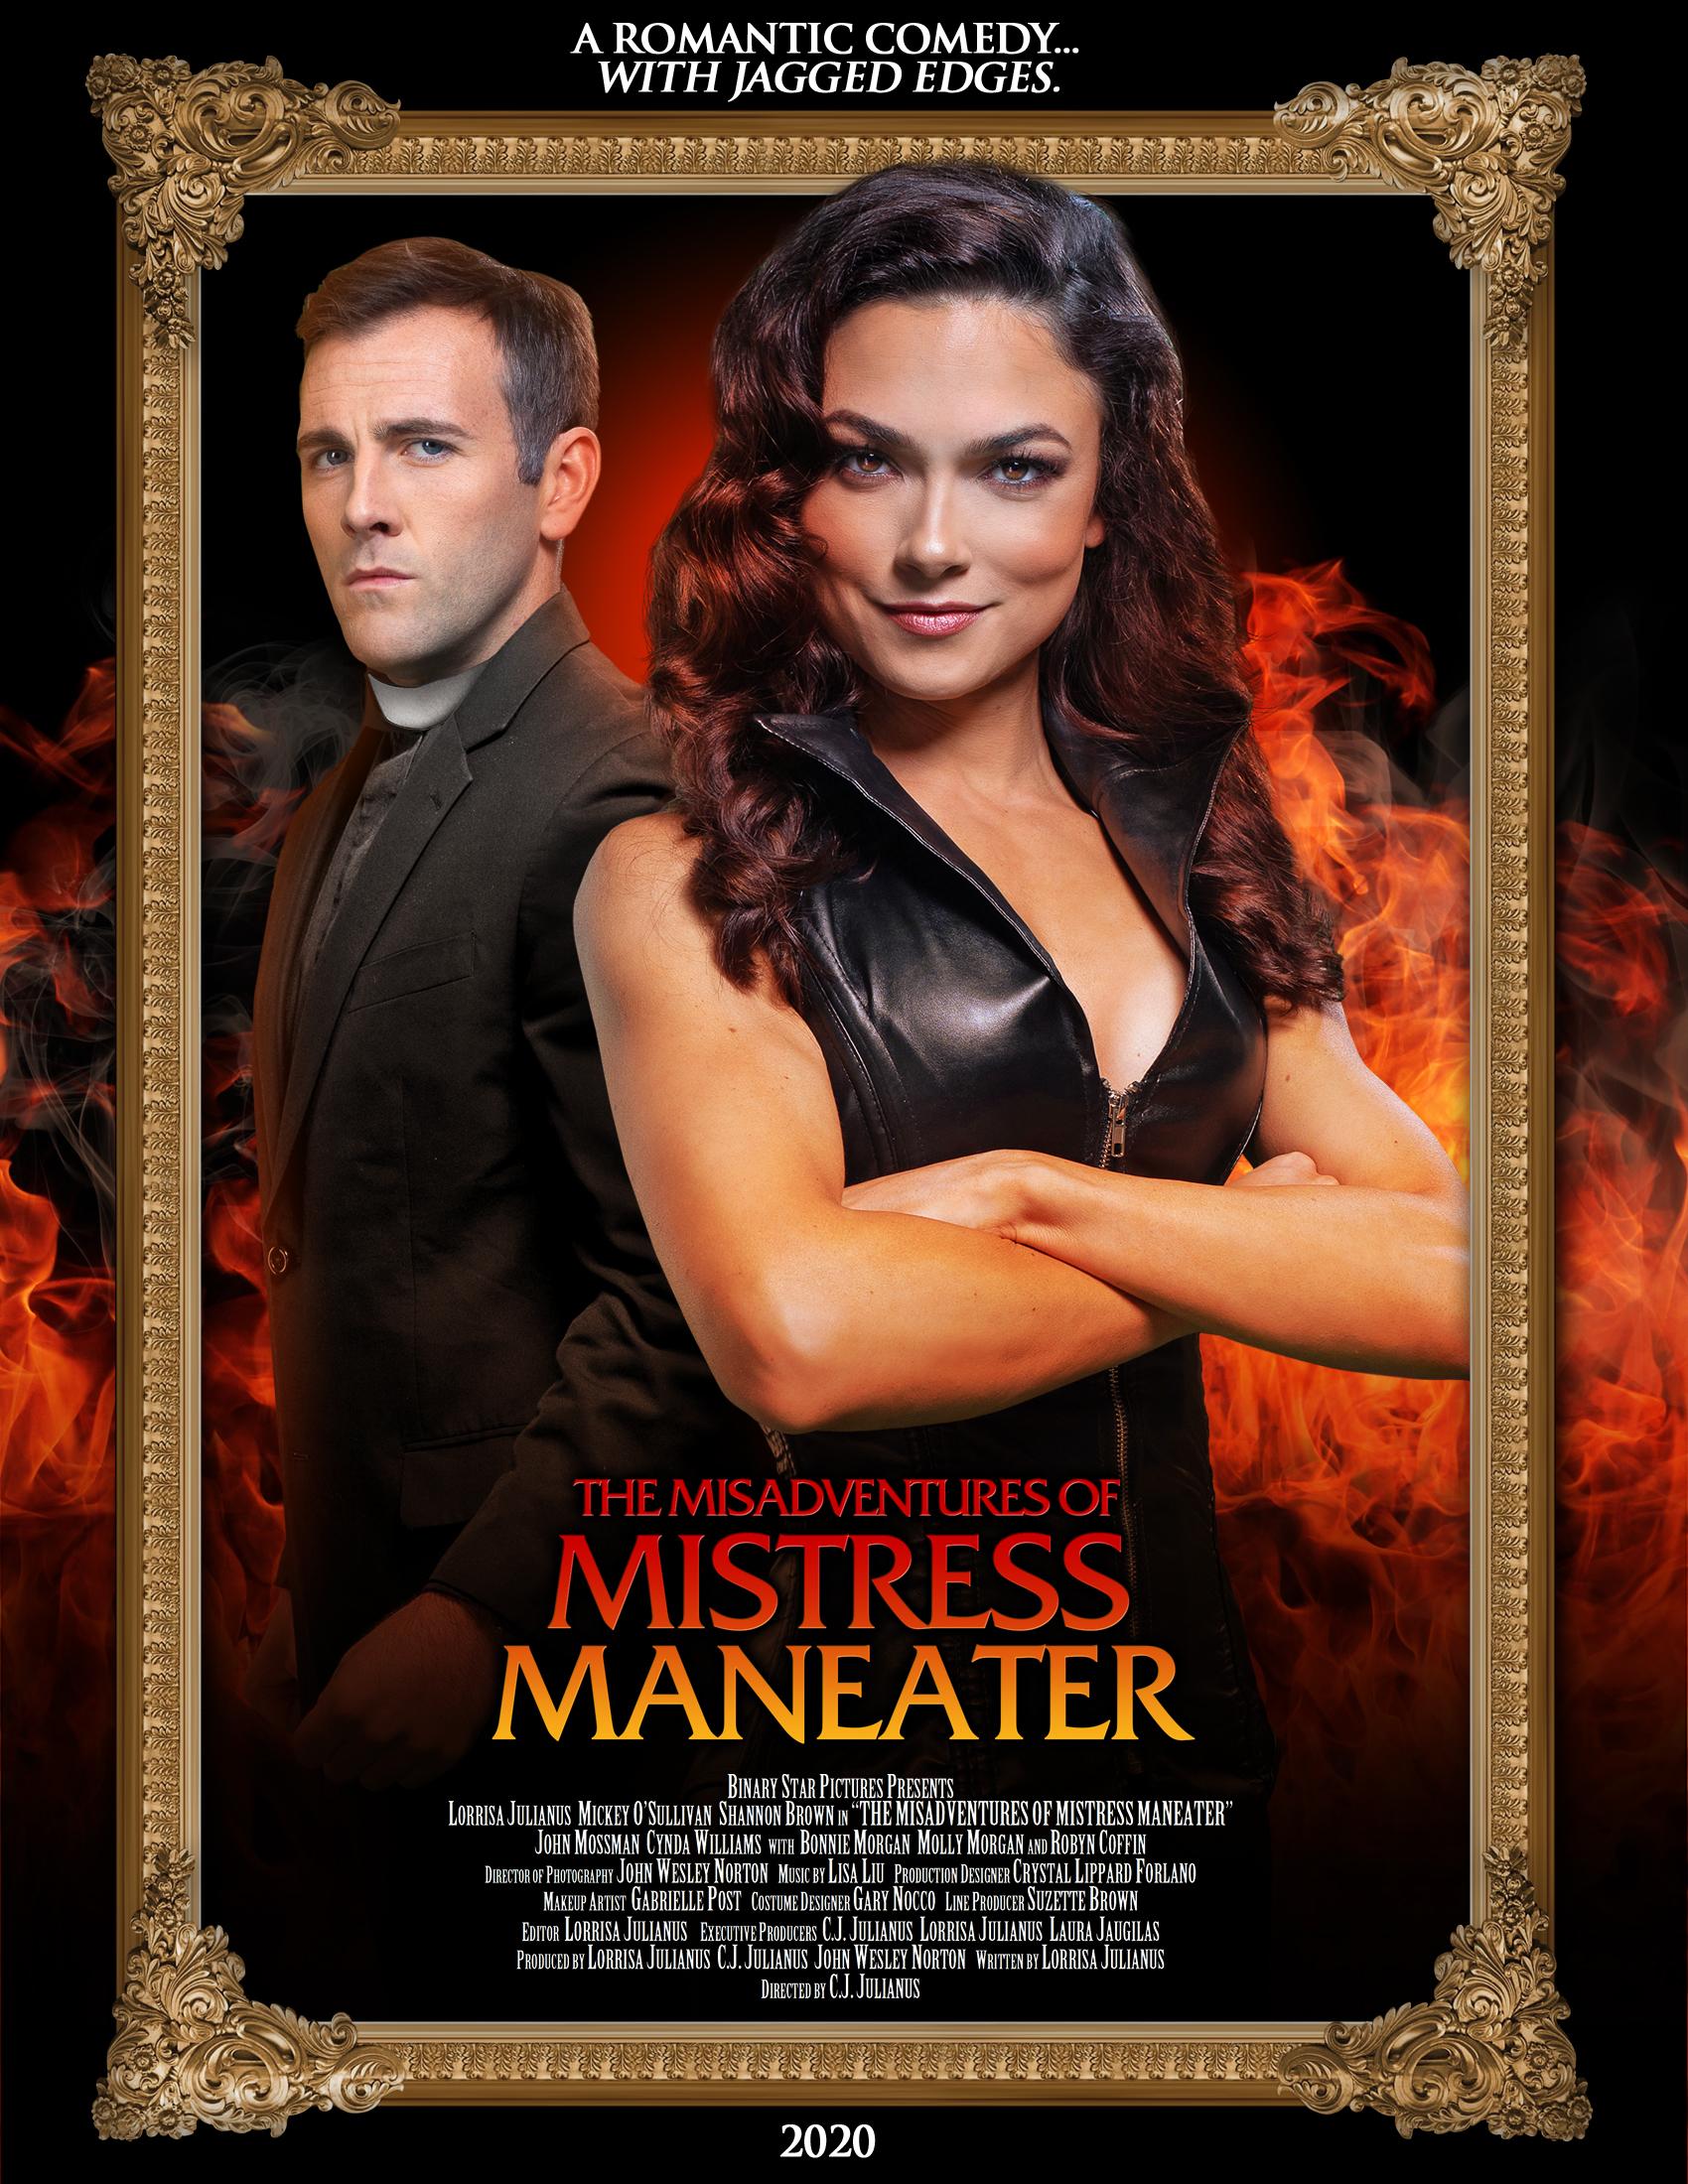 The Misadventures Of Mistress Maneater 2020 English AMZN WEBRip 720p DL